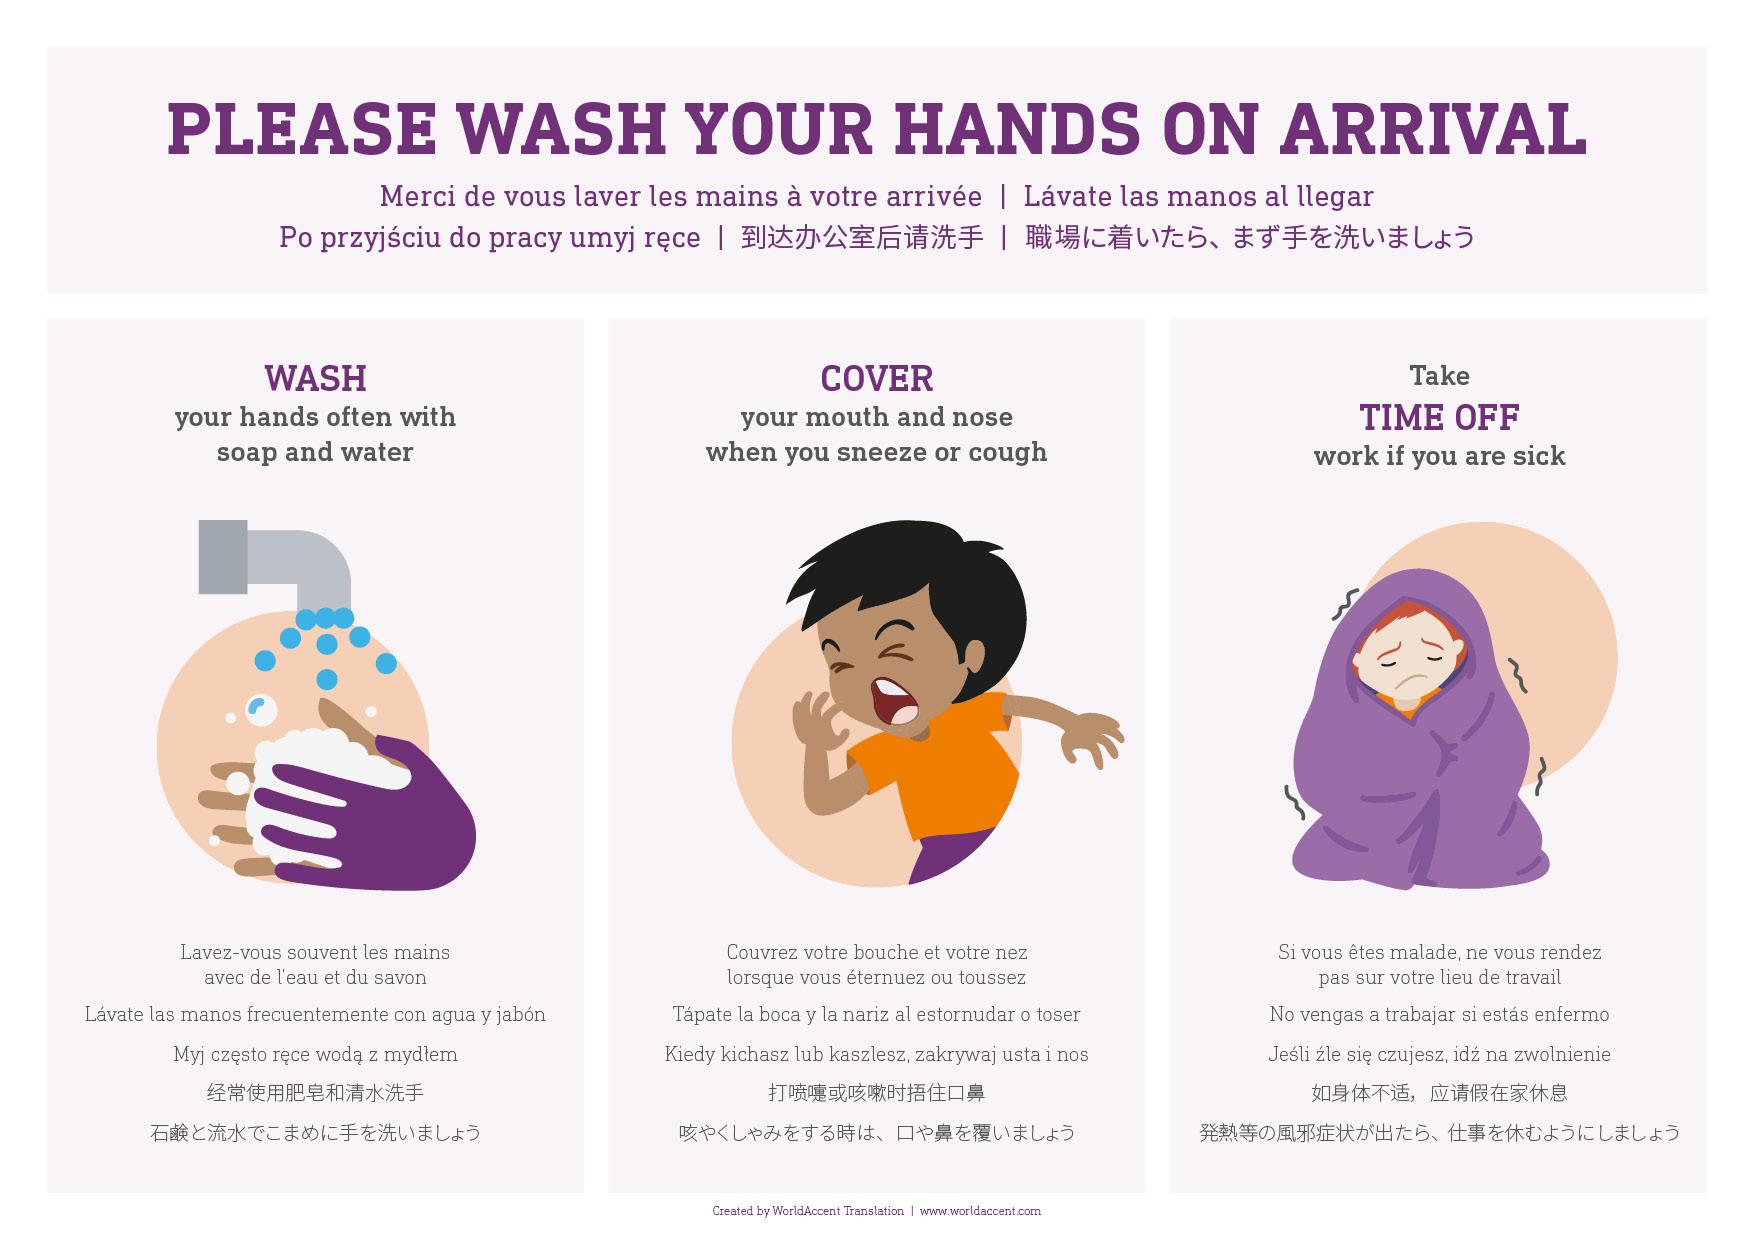 Coronavirus poster in English French Spanish Polish Simplified Chinese Japanese